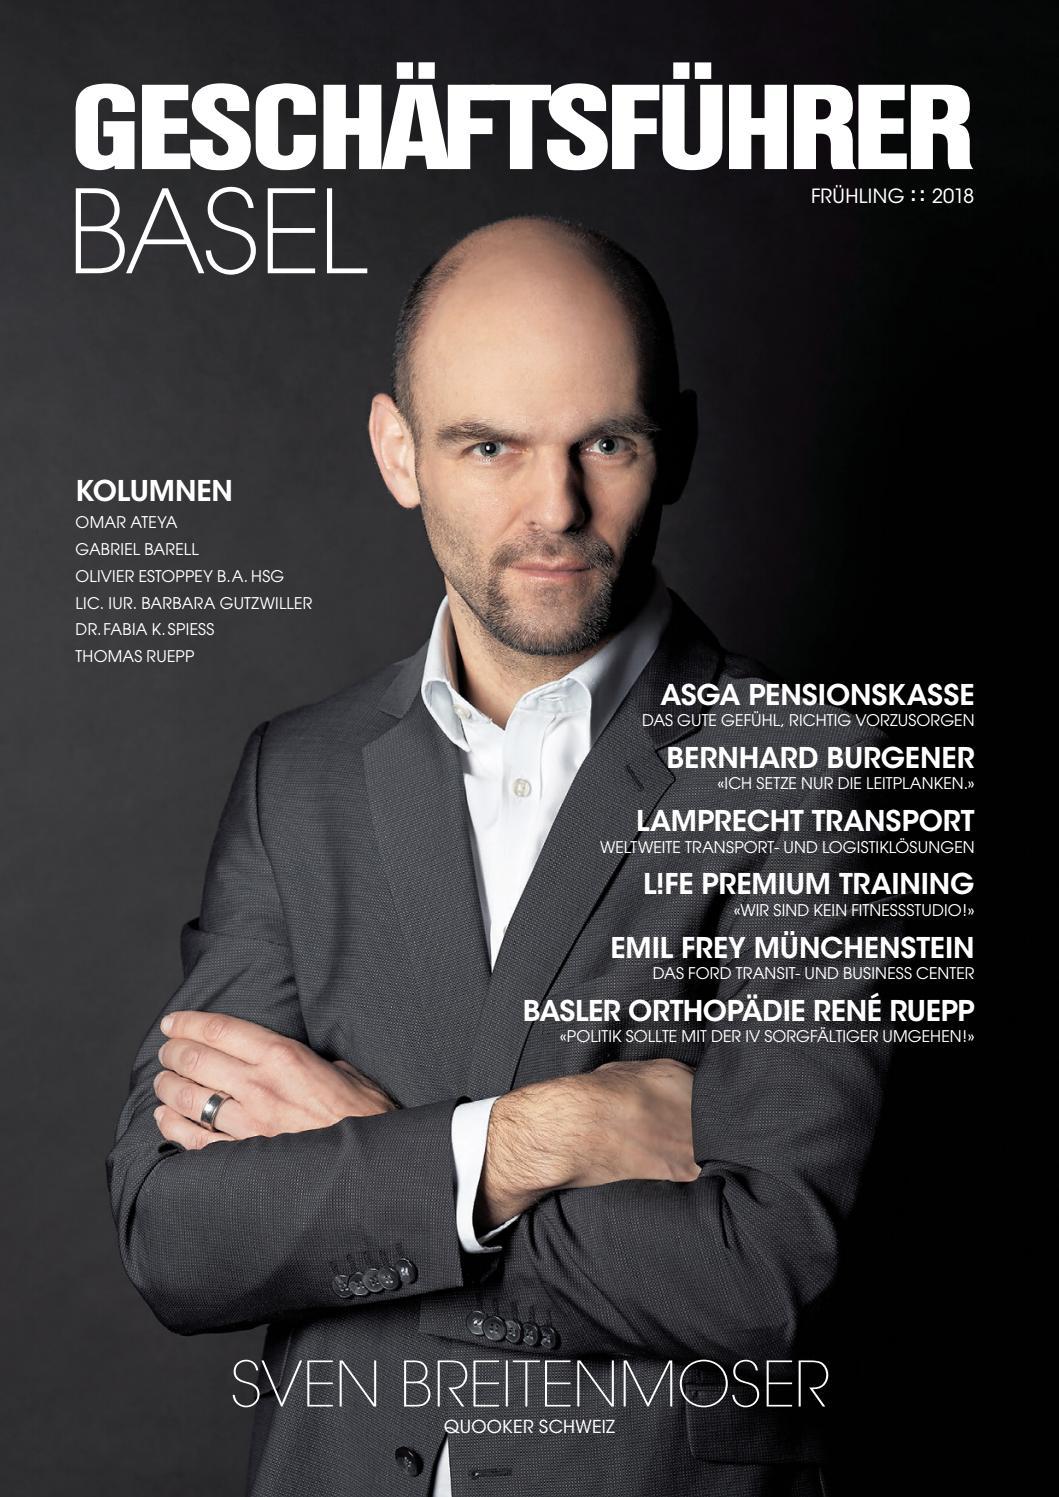 Geschäftsführer Basel 01/2018 by rundschauMEDIEN AG - issuu